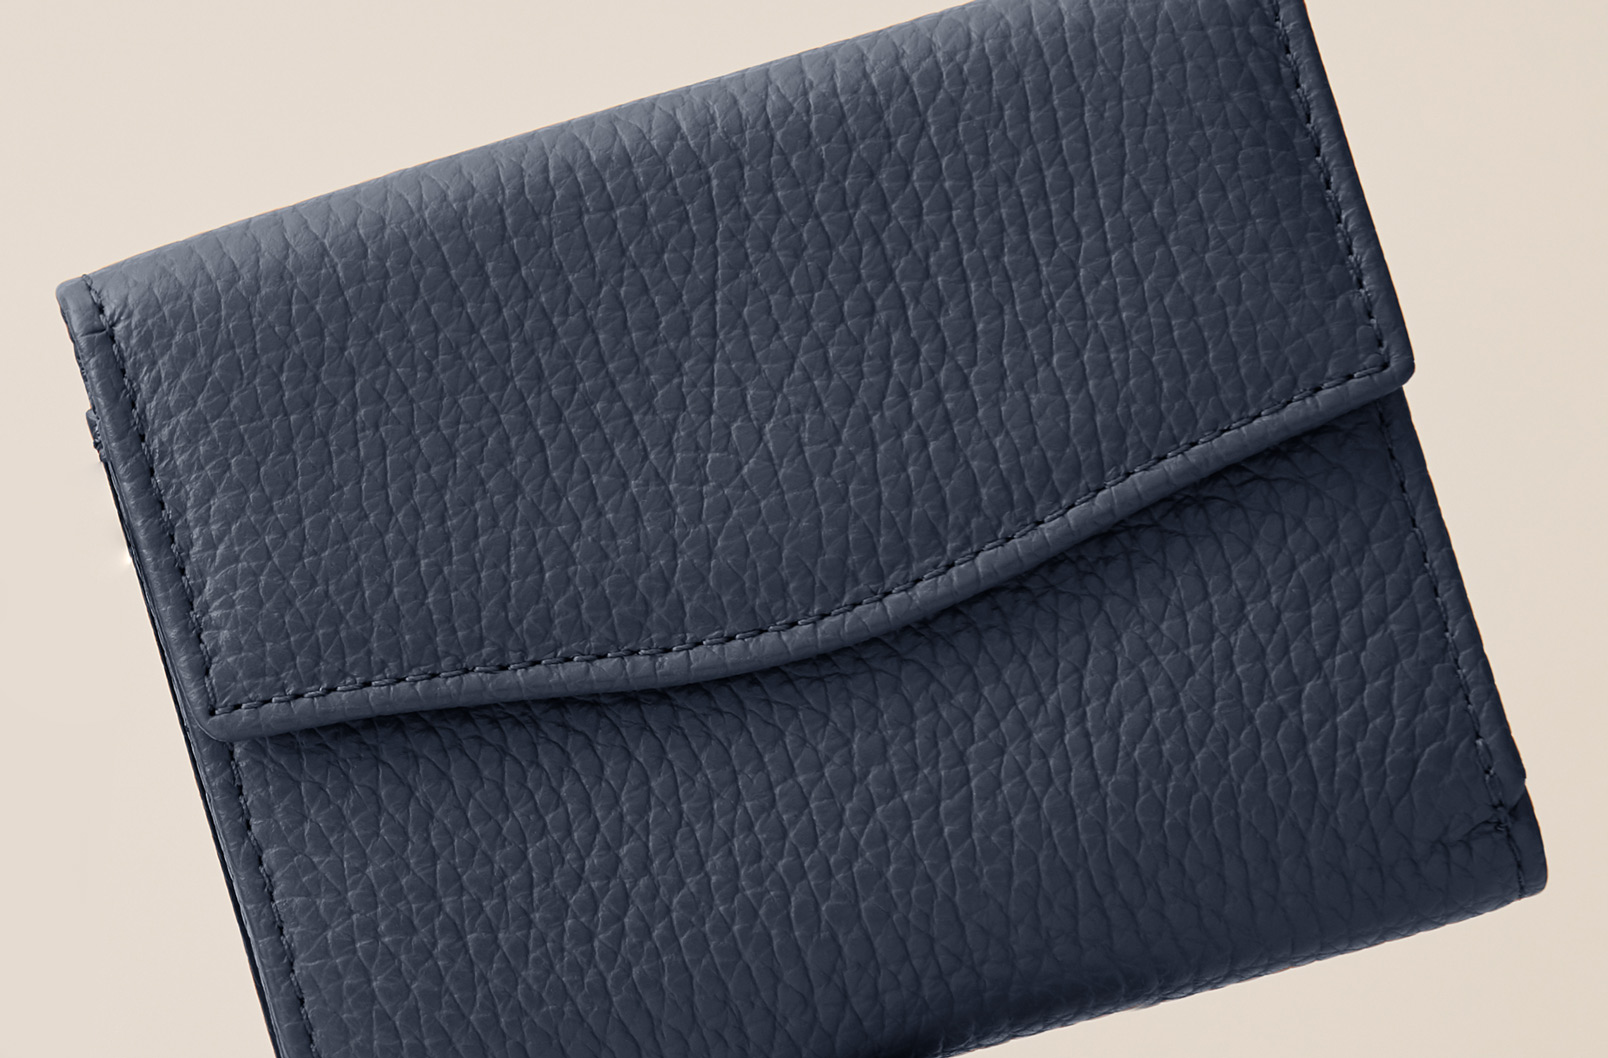 Cuyana Classic Small Flap Wallet Exterior Flap Closure